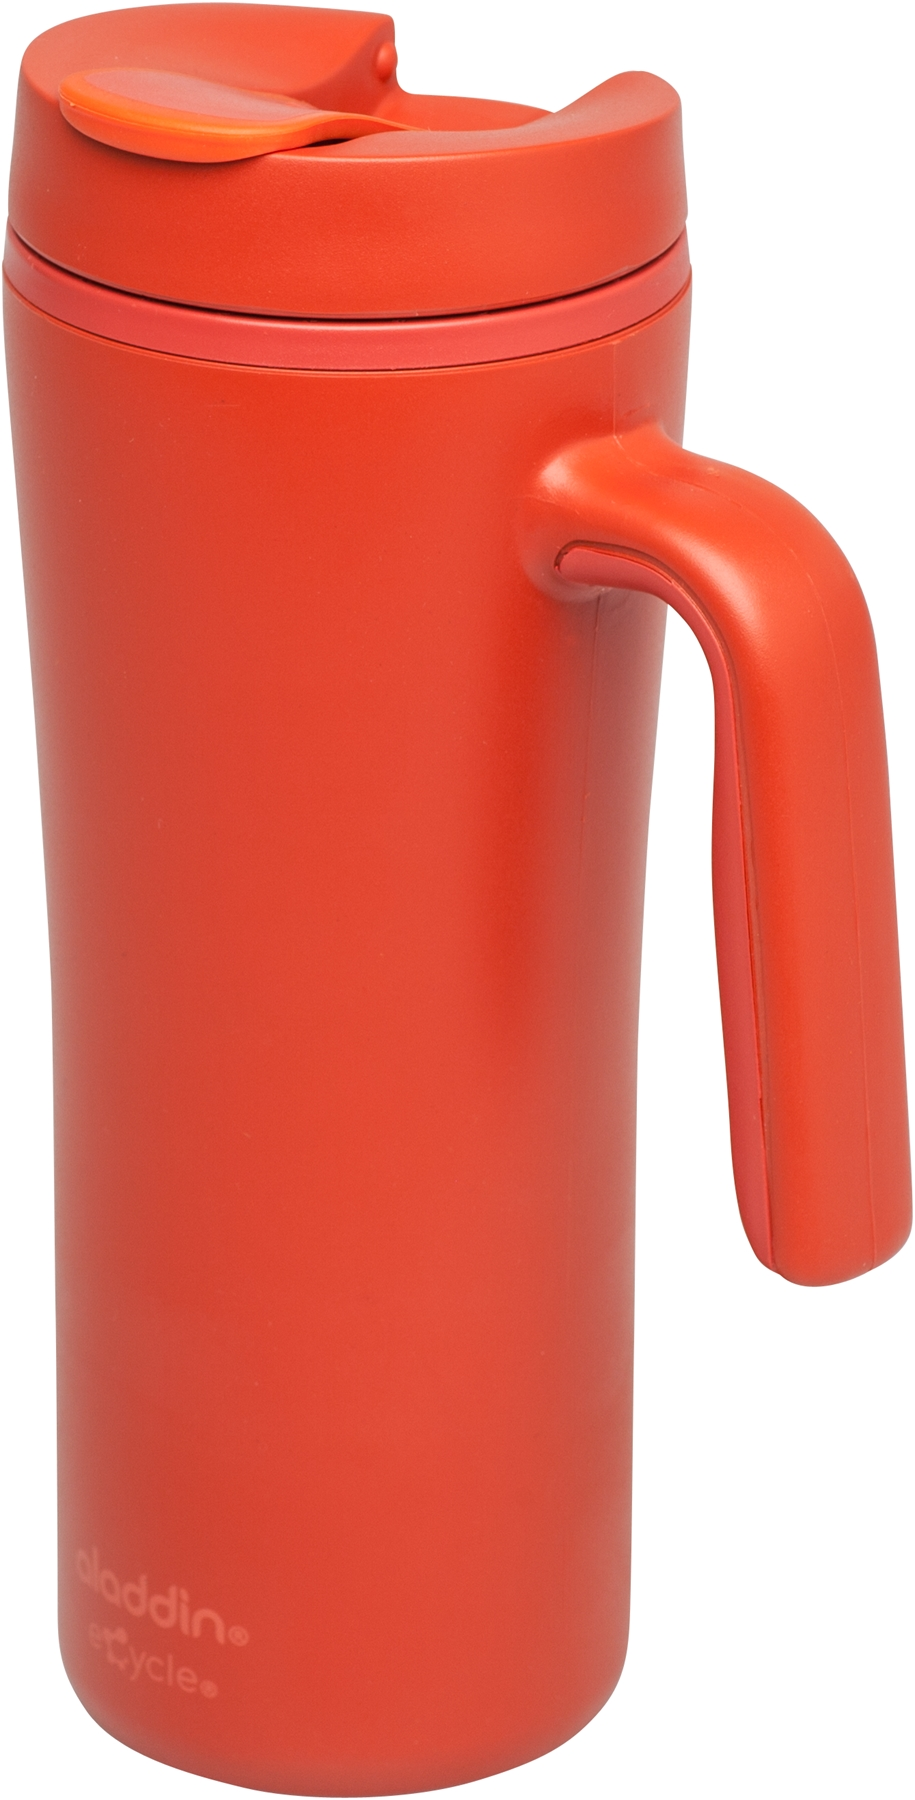 Termohrnek aladdin Flip-Seal s uchem červený